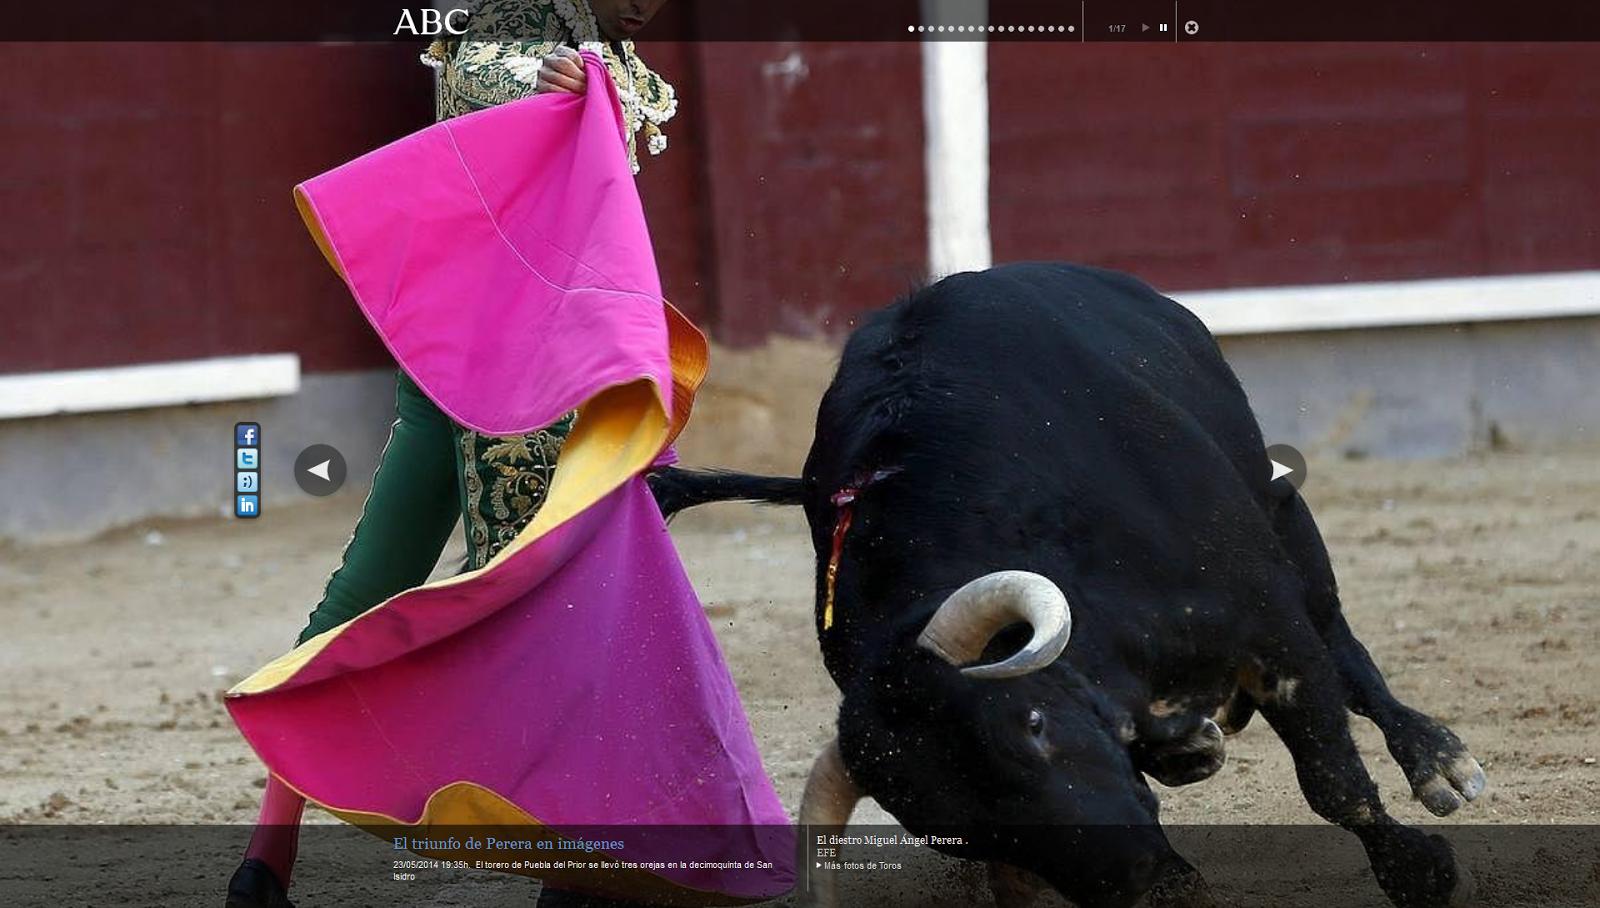 http://www.abc.es/fotos-toros/20140523/triunfo-perera-imagenes-1612634602205.html?elemento=1